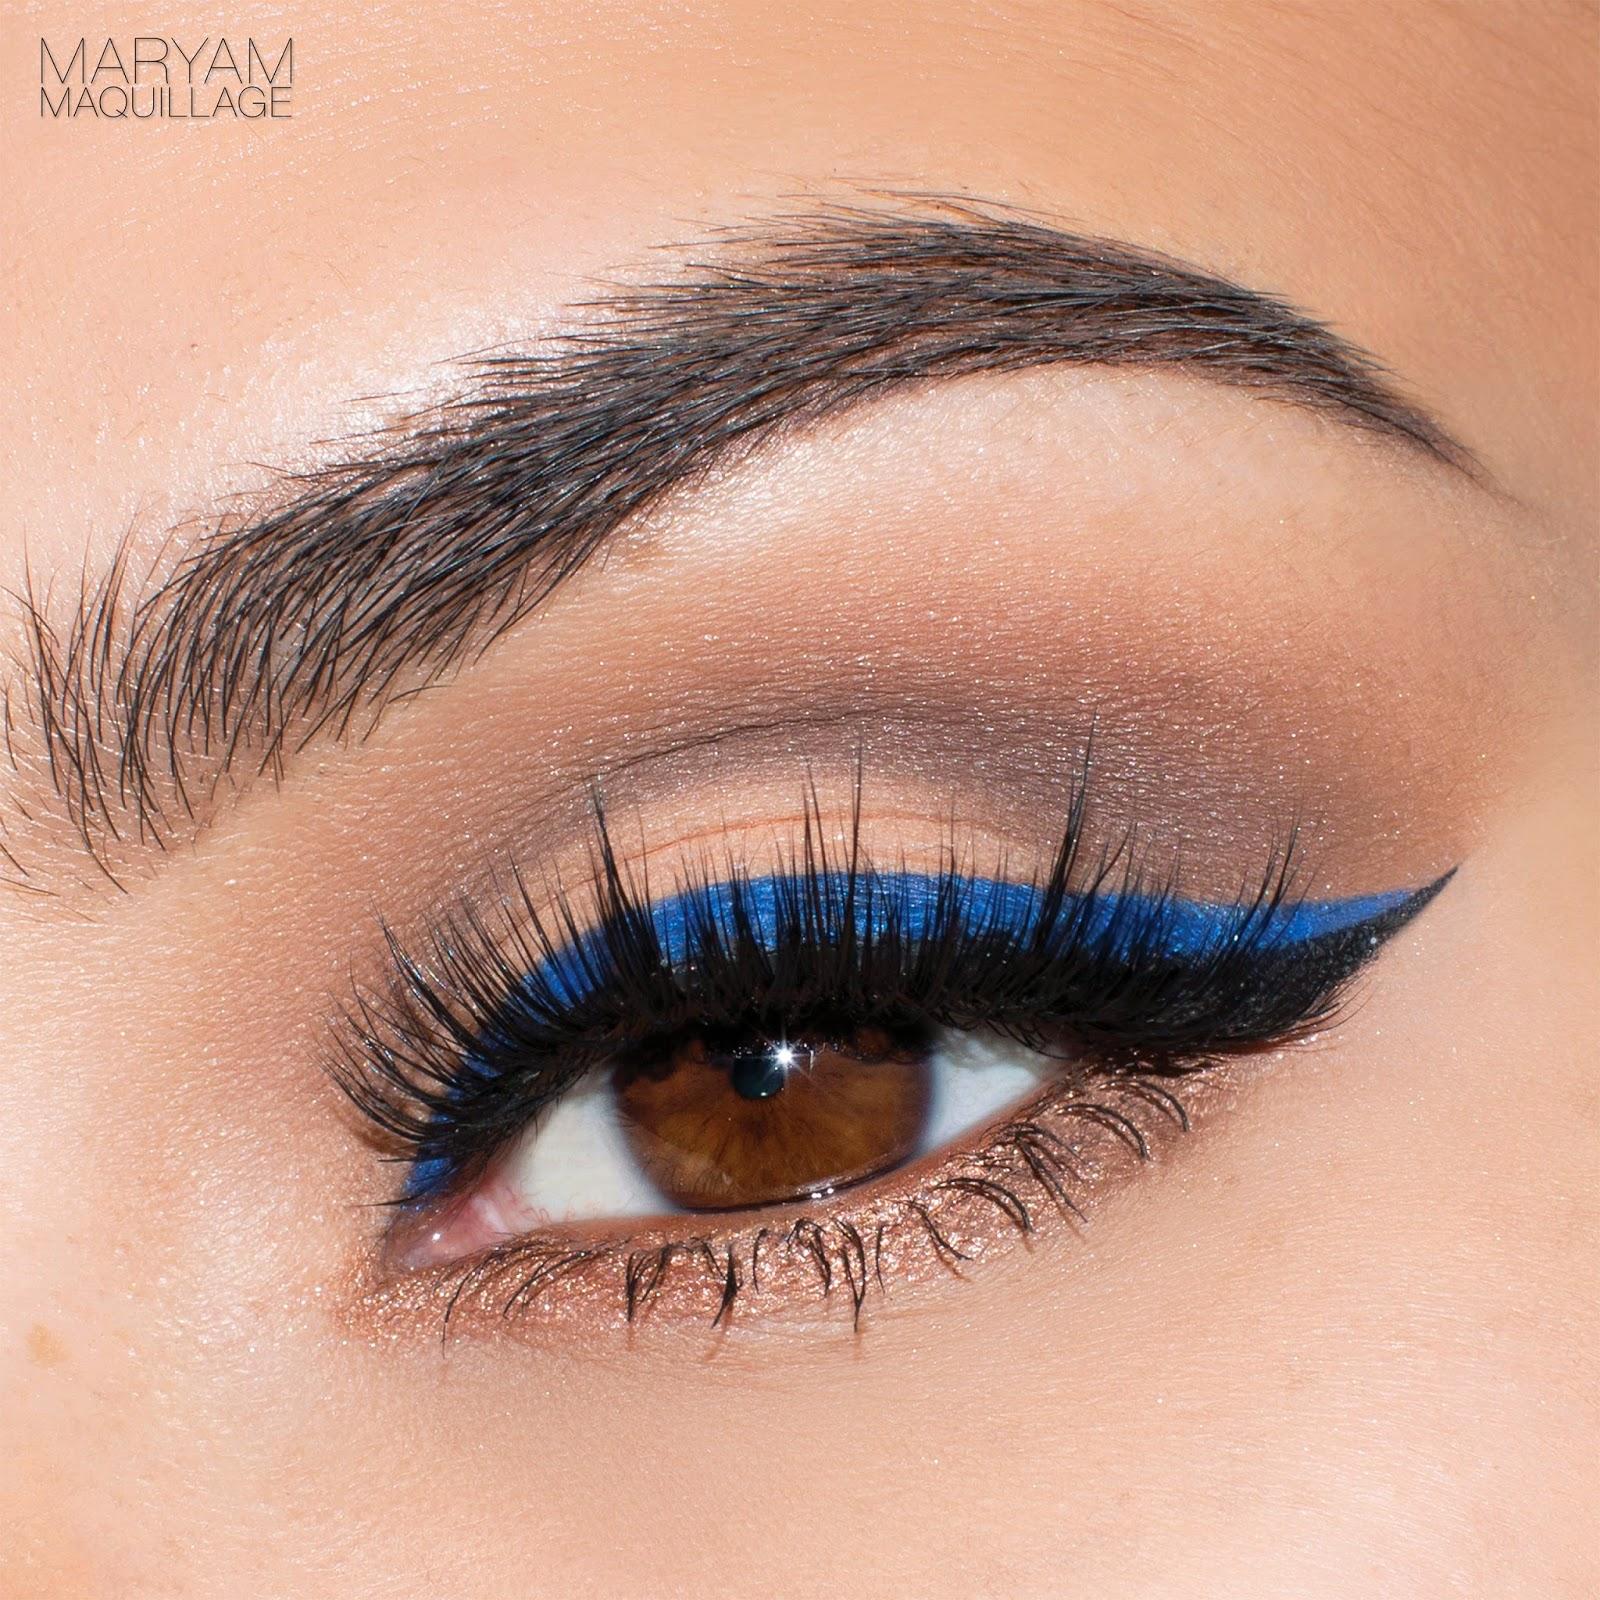 Maryam Maquillage Pop Of Blue Cat Eye Spring Makeup Tutorial